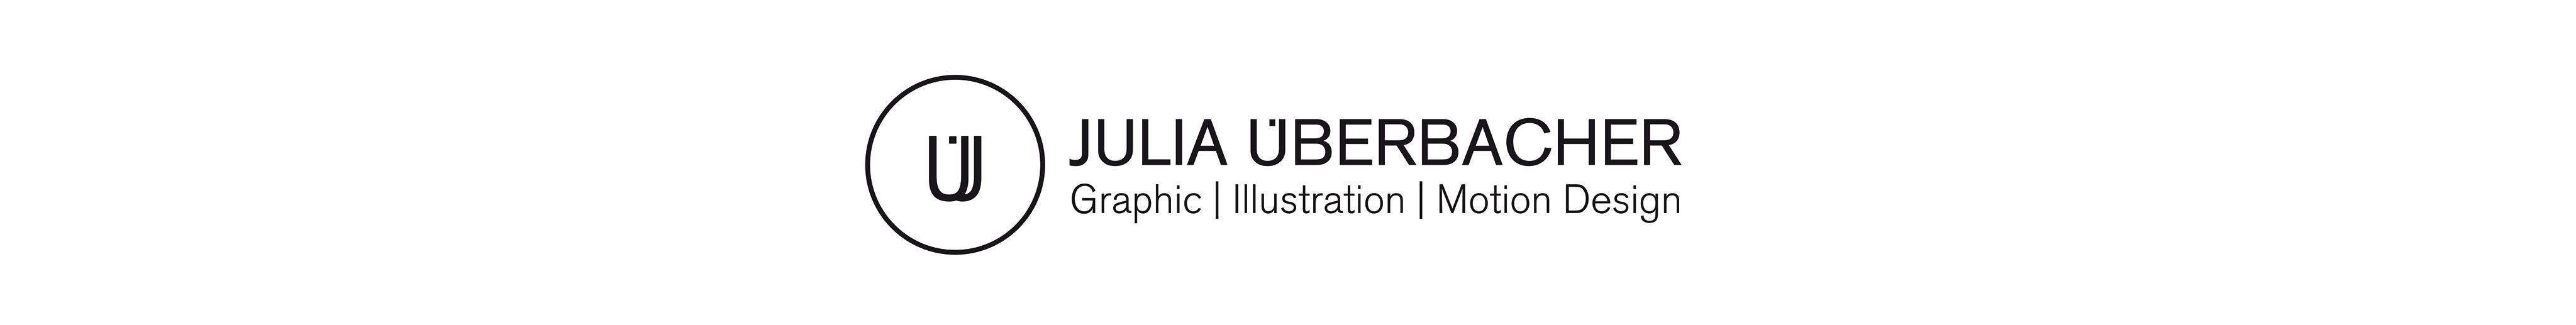 Julia Überbacher